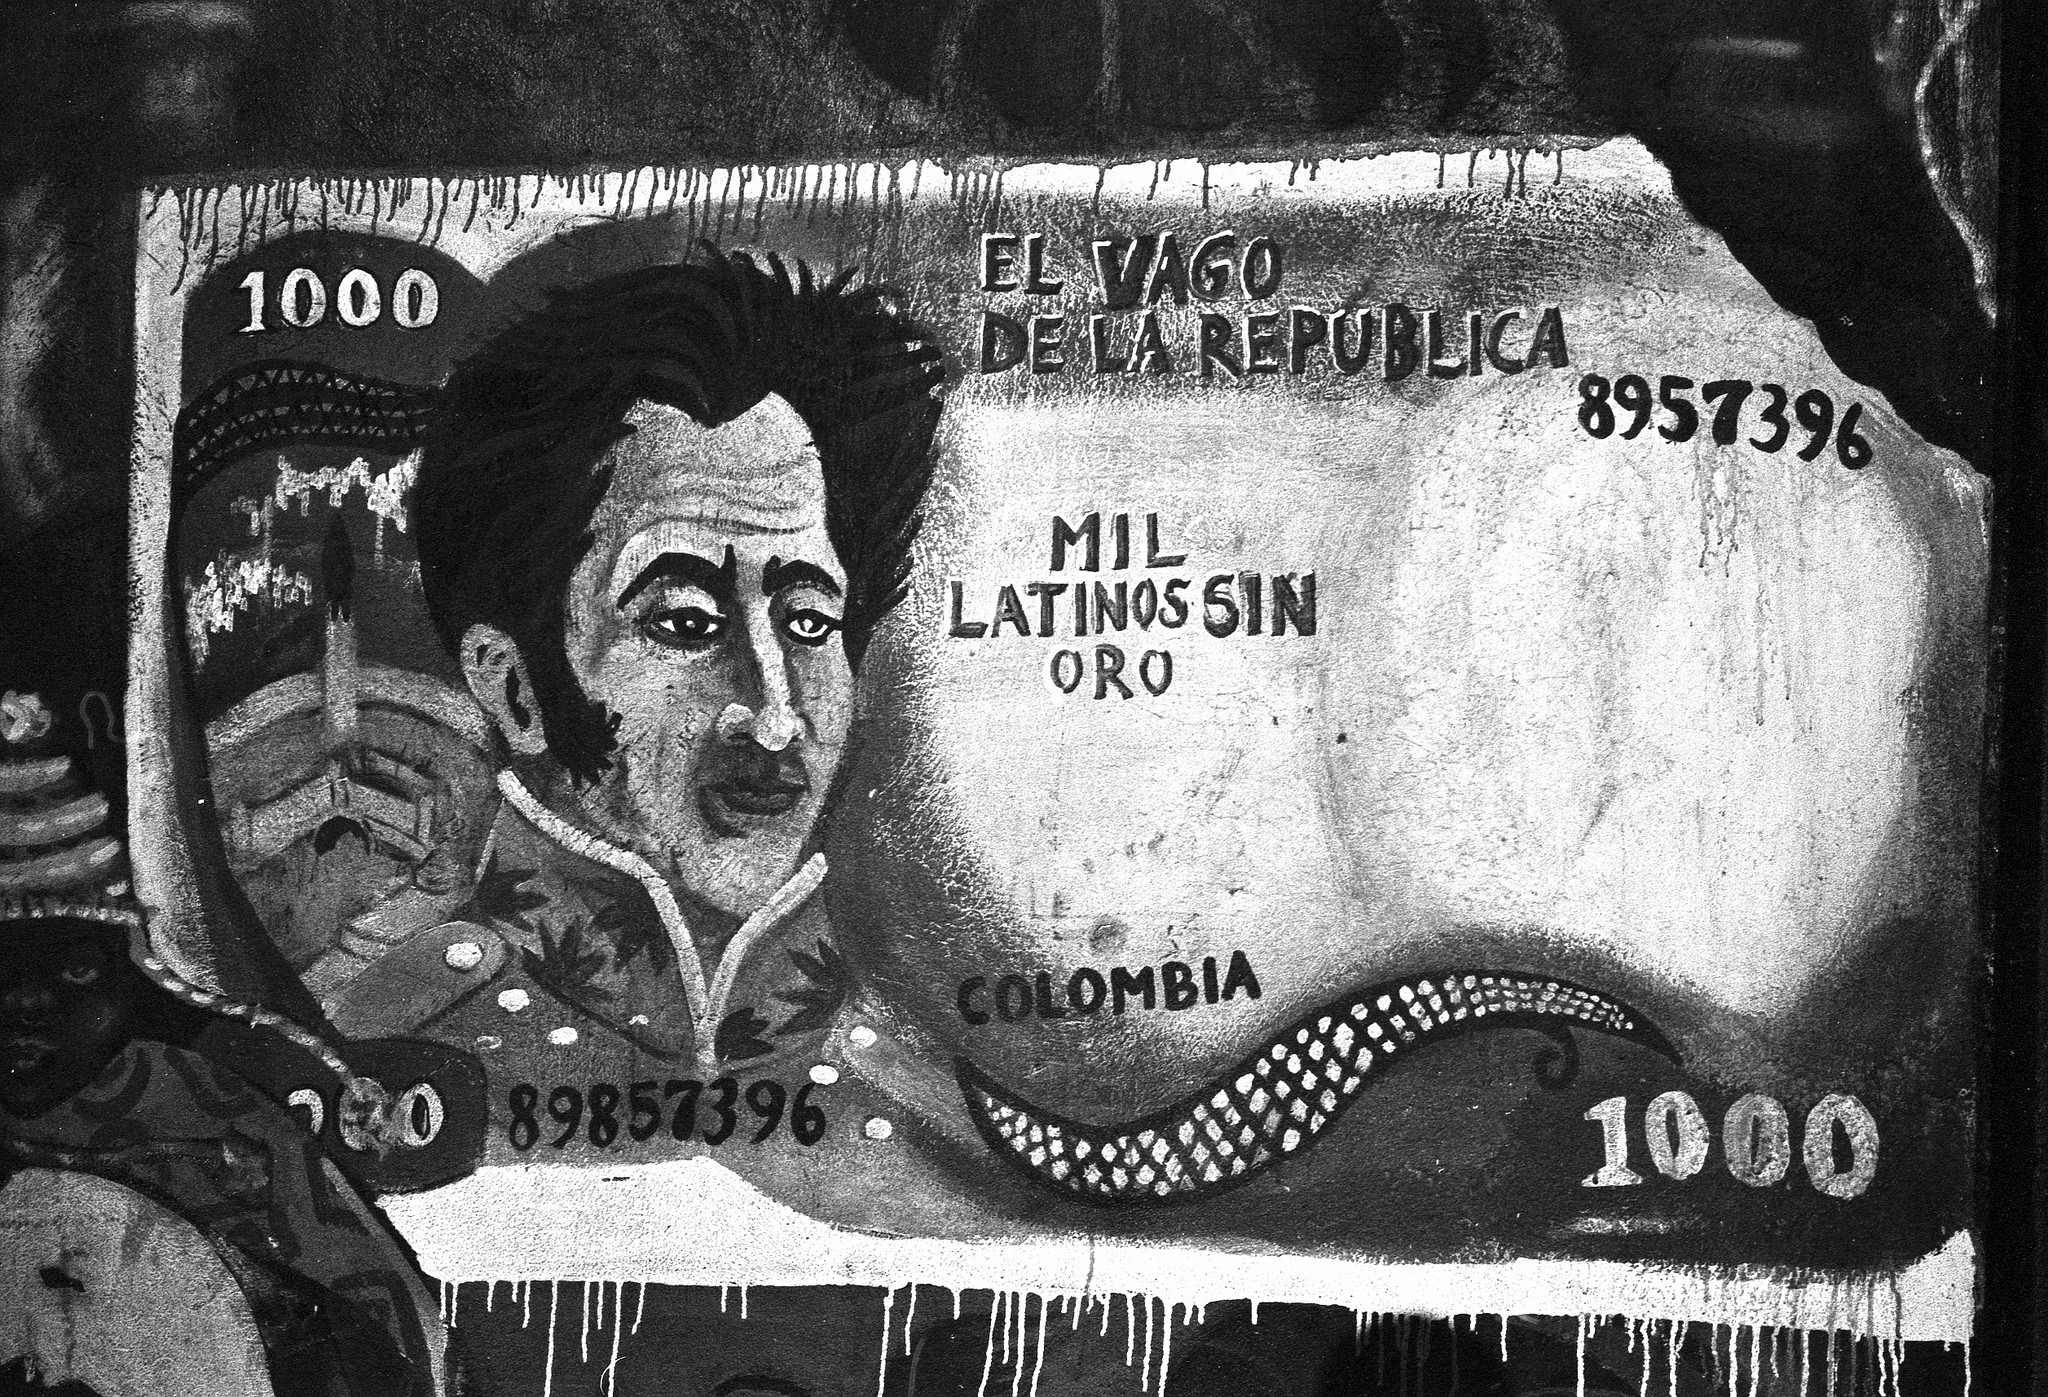 latin american cinema essays on modernity gender and national identity